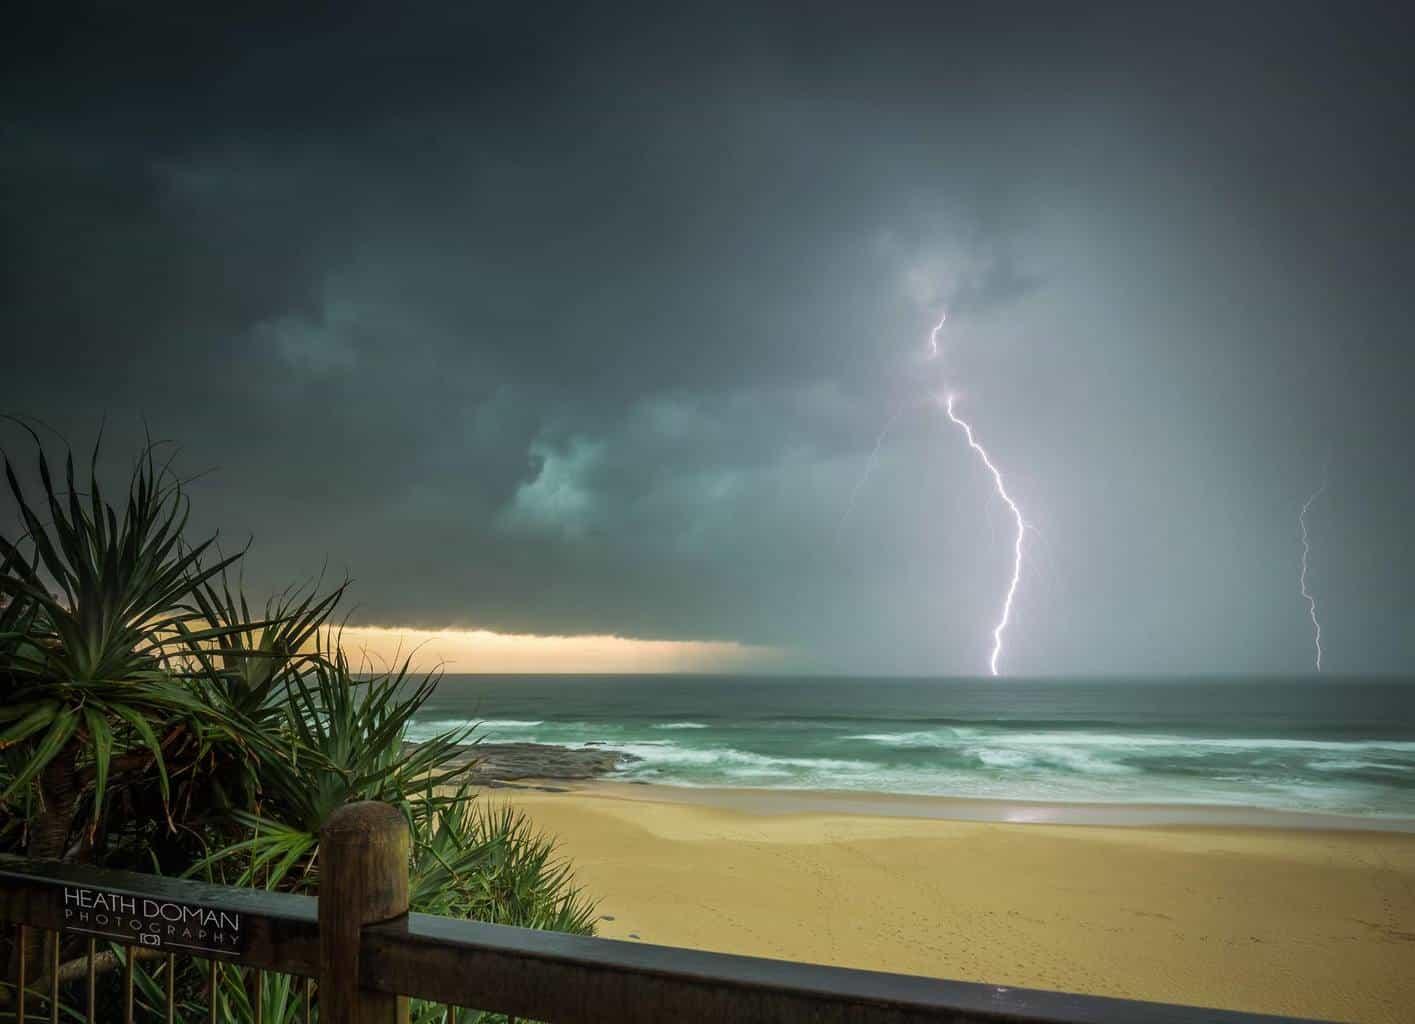 Point Cartwright Australia yesterday. Single 1.6 second exposure on burst